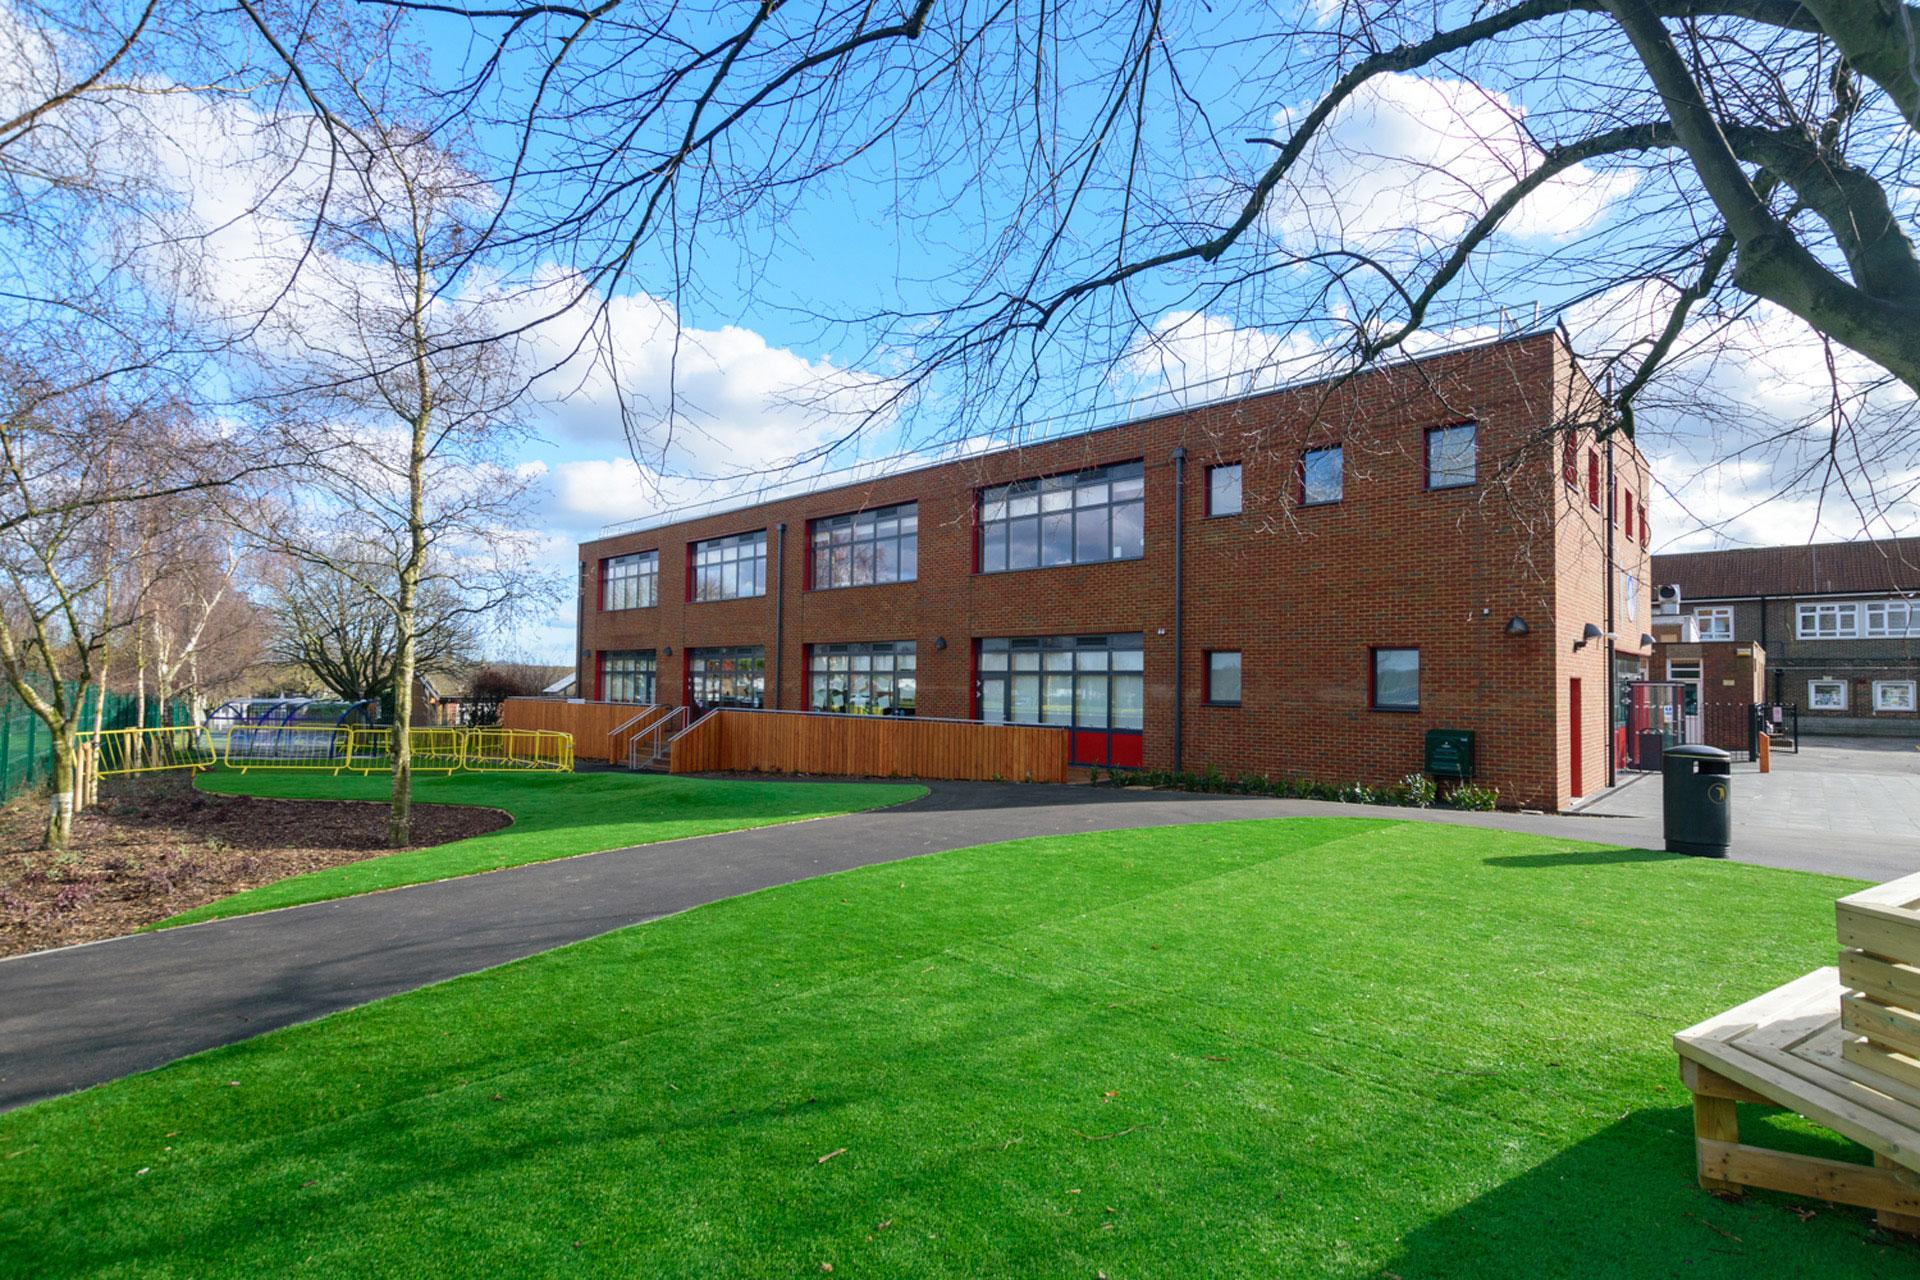 Woodcote Primary school - Modular School expansion - external